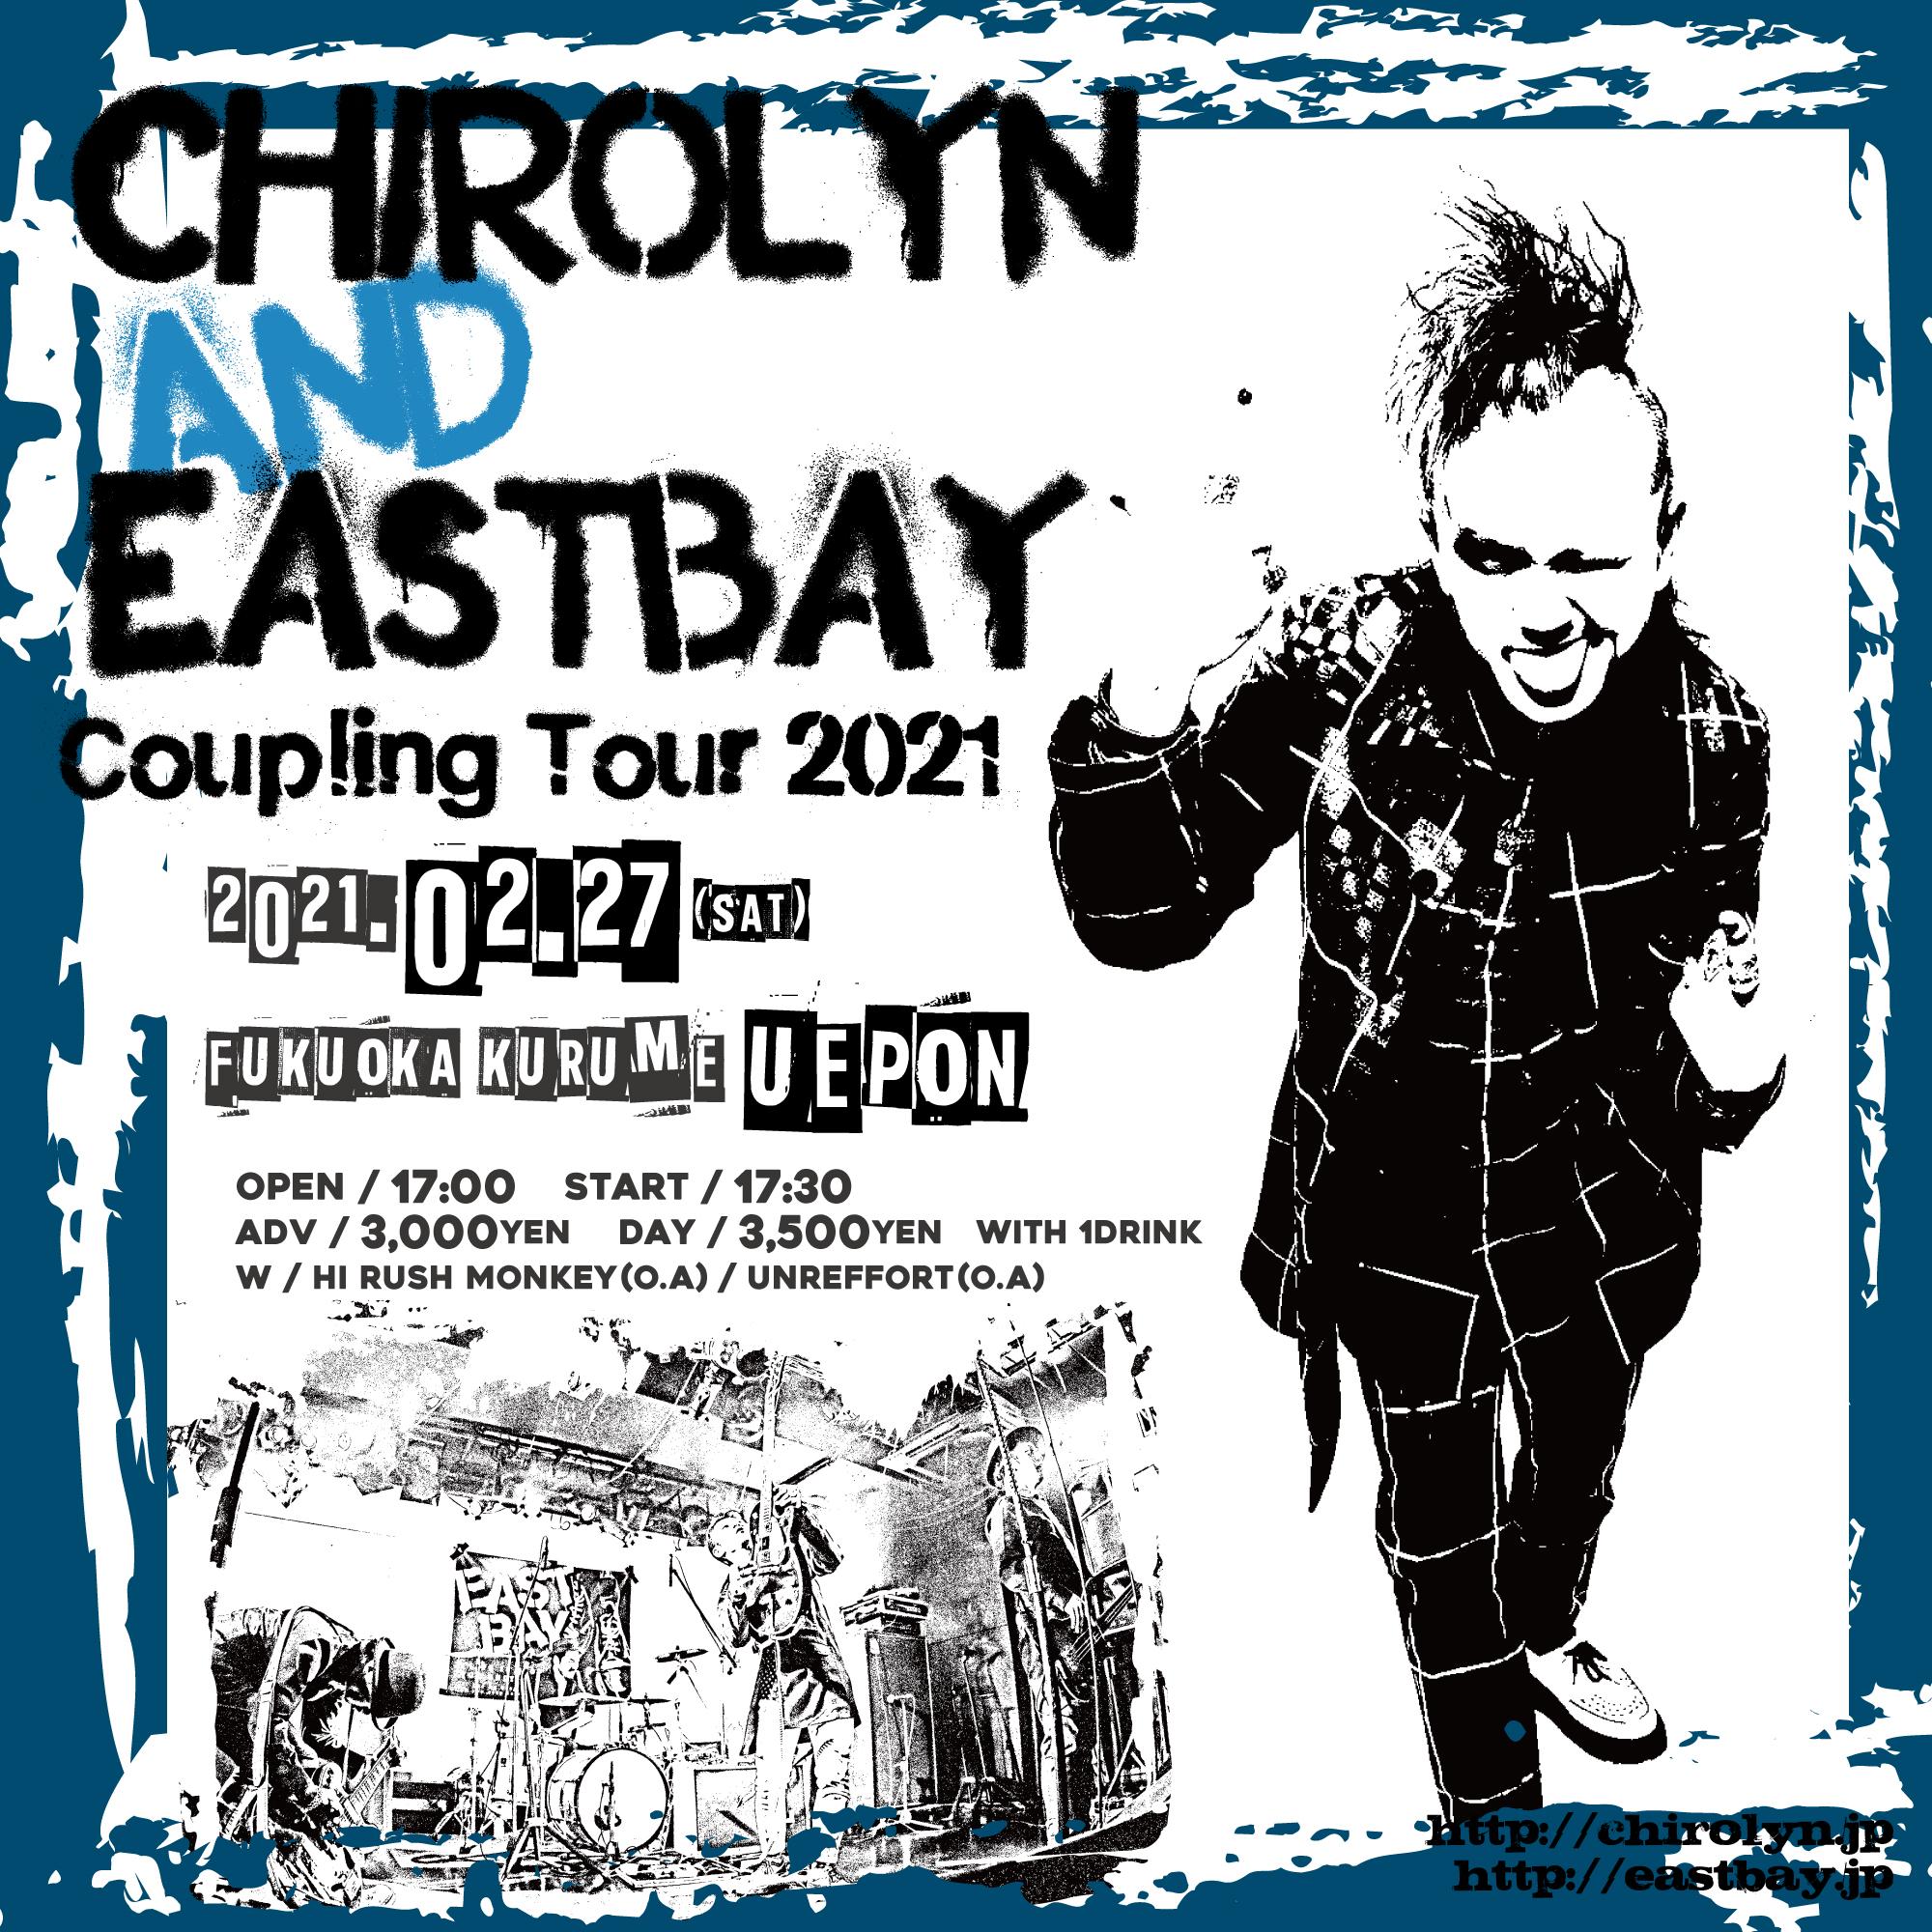 Chirolyn & EASTBAY Coupling Tour 2021 in 久留米の写真